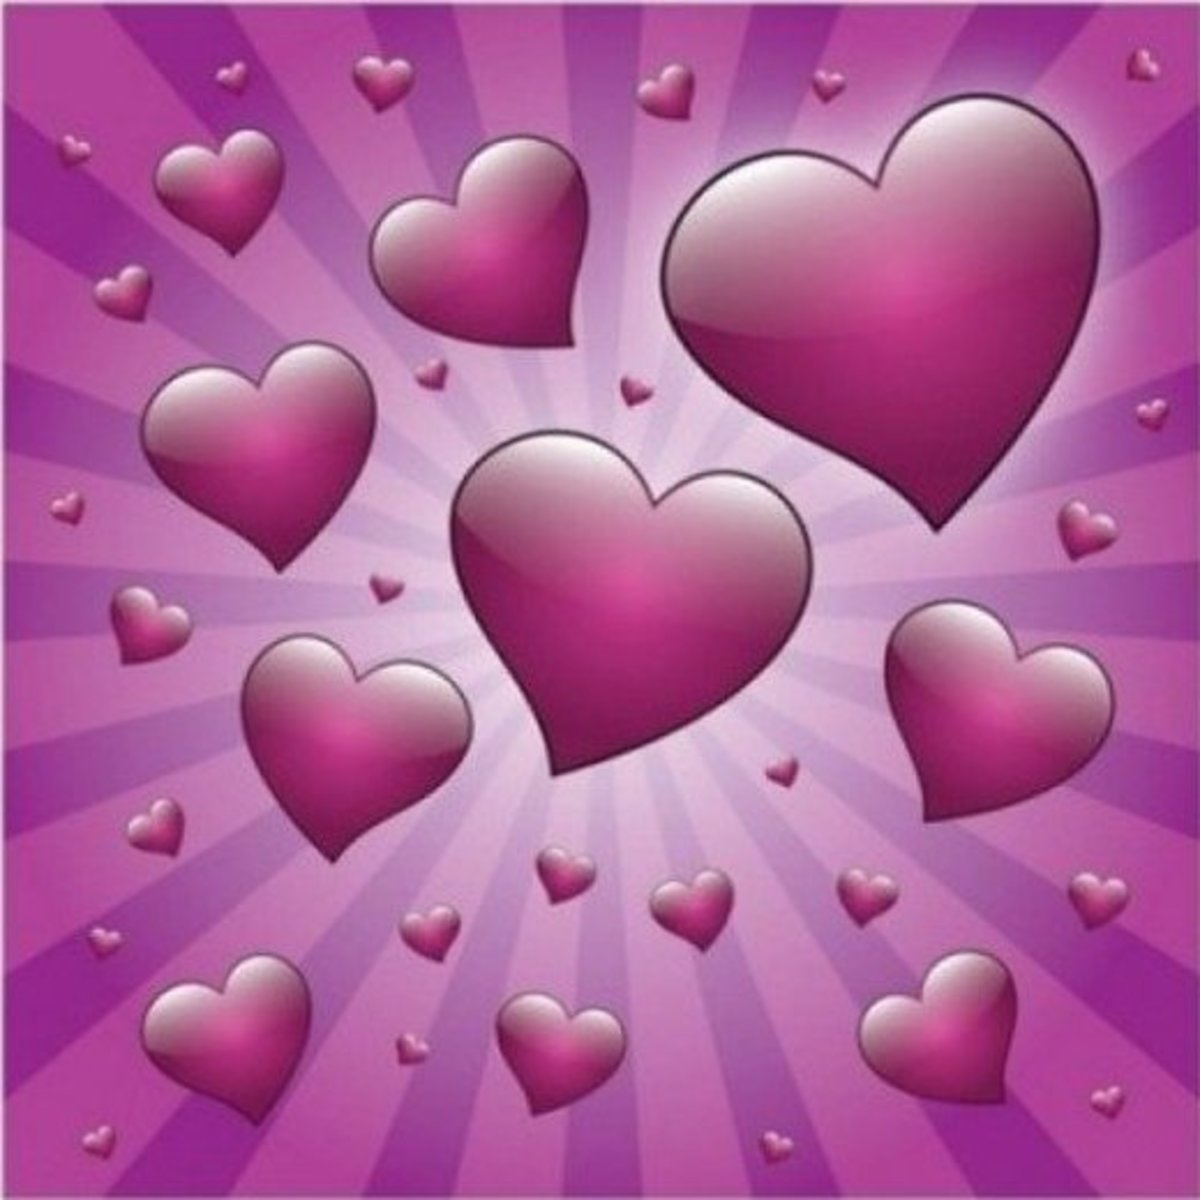 Heart Graphic Art